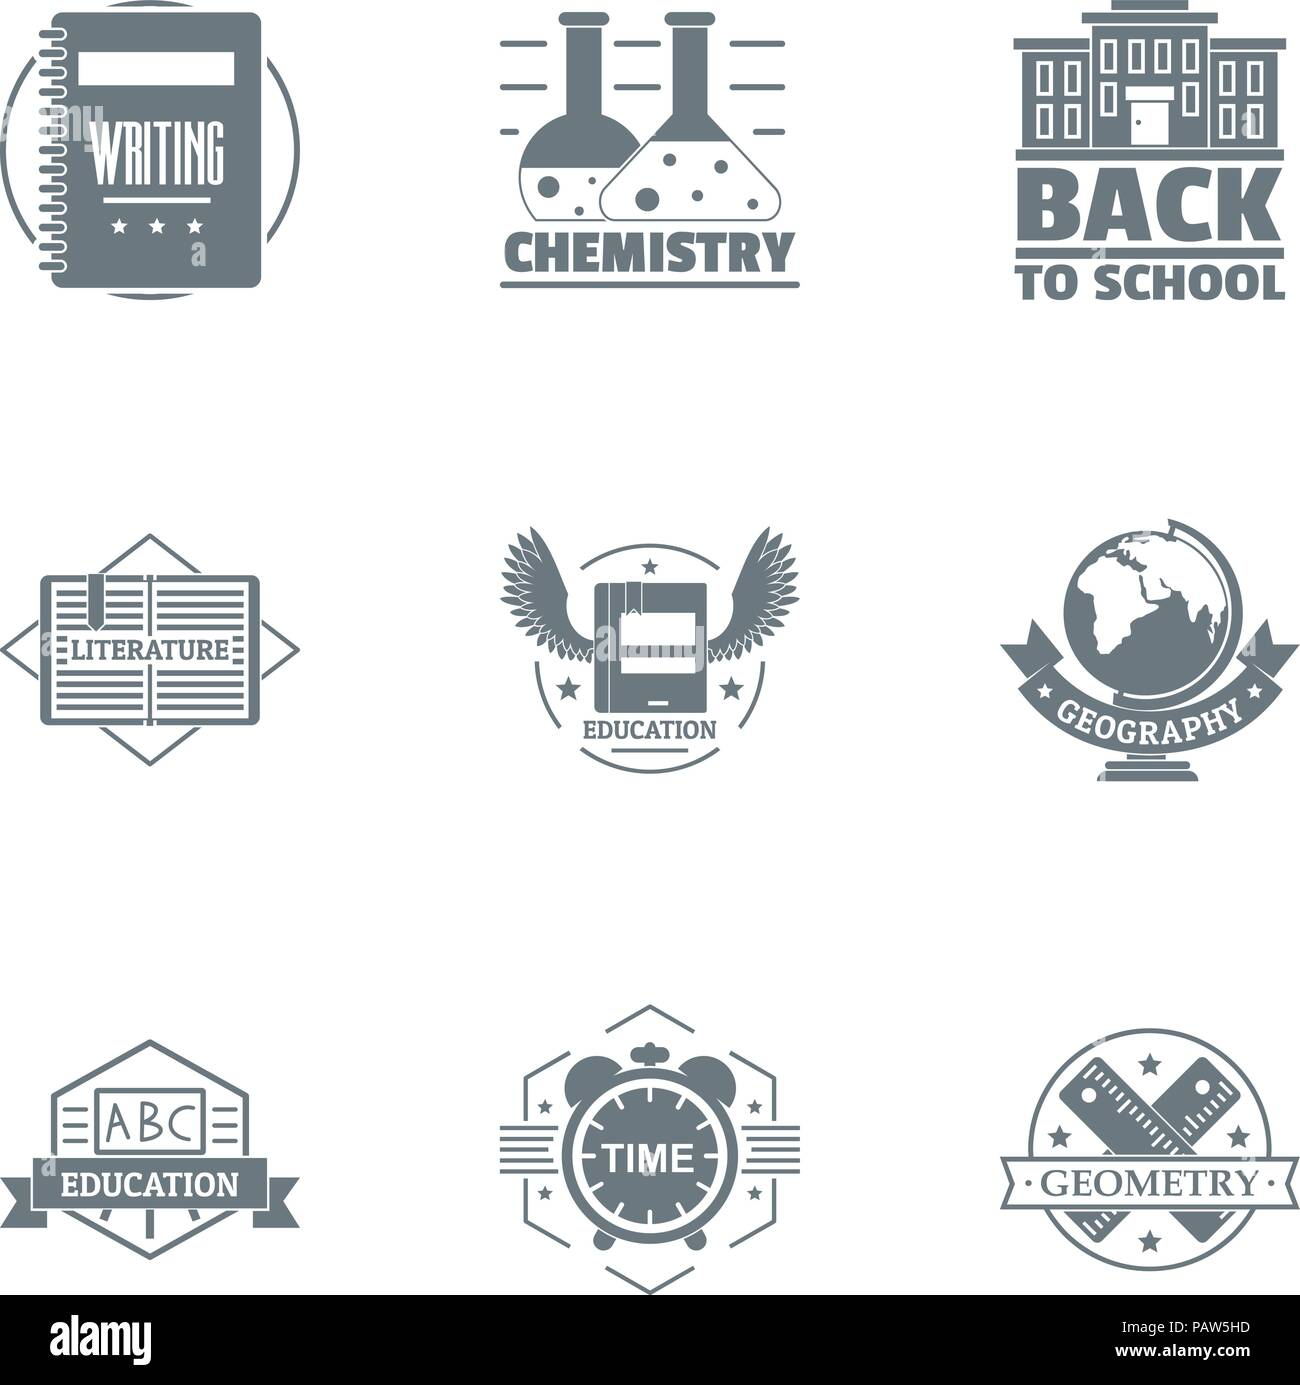 Chemical school logo set, simple style - Stock Image